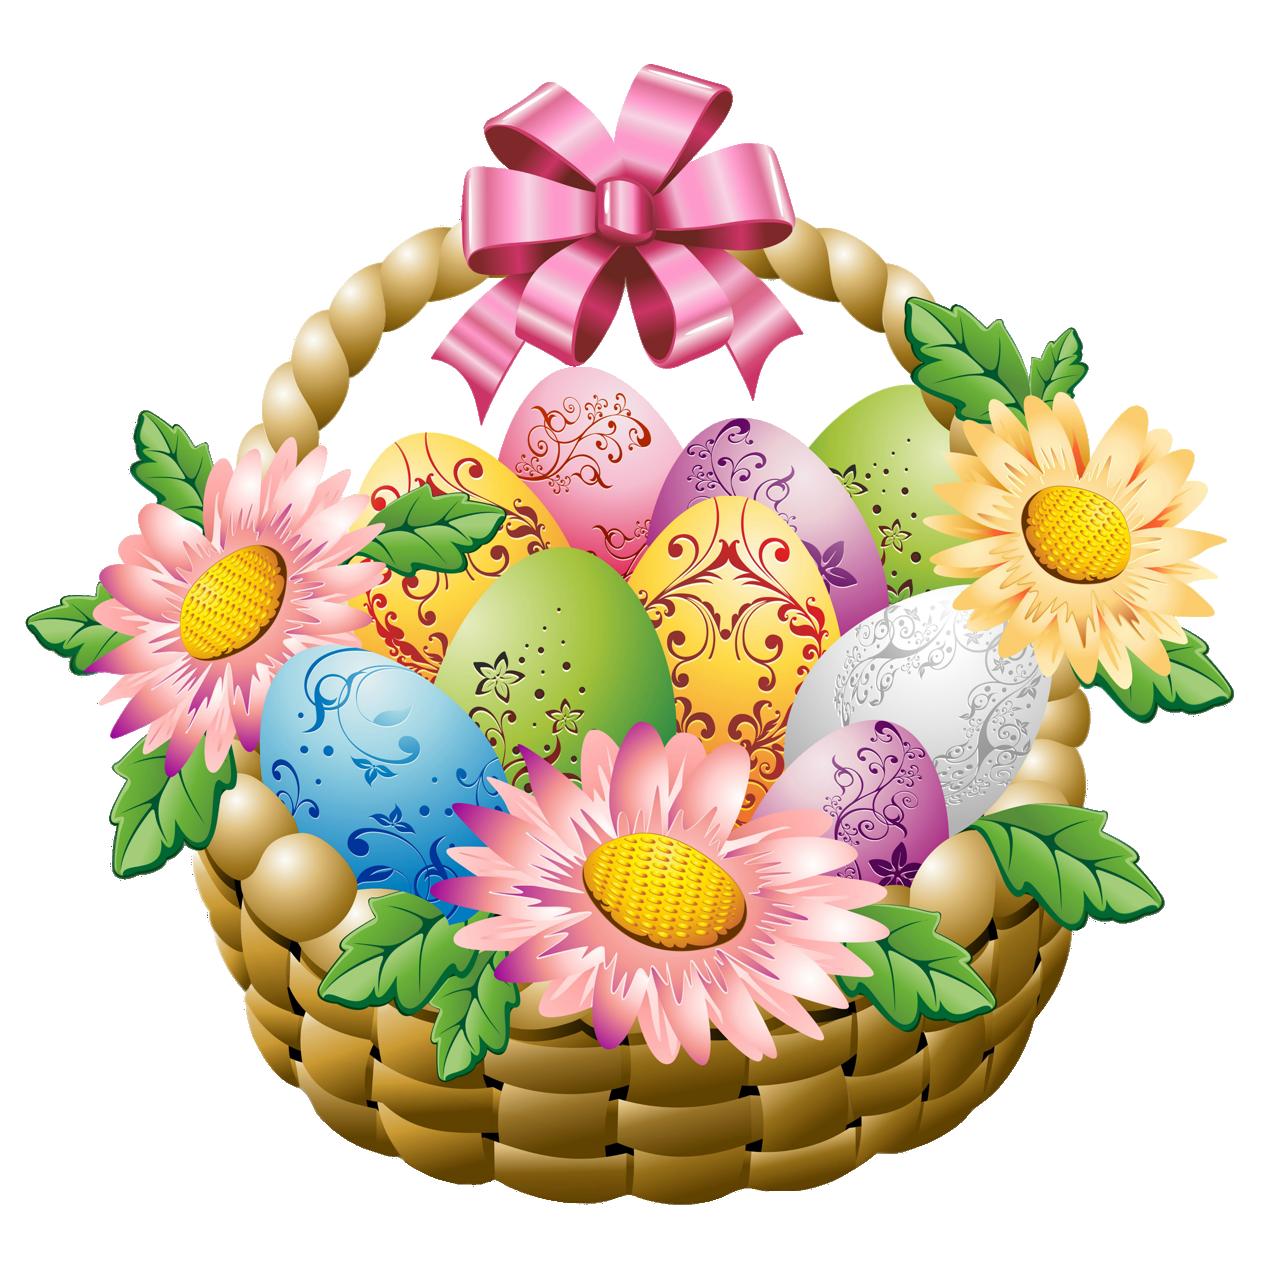 1280x1280 Gift Clipart Flower Basket